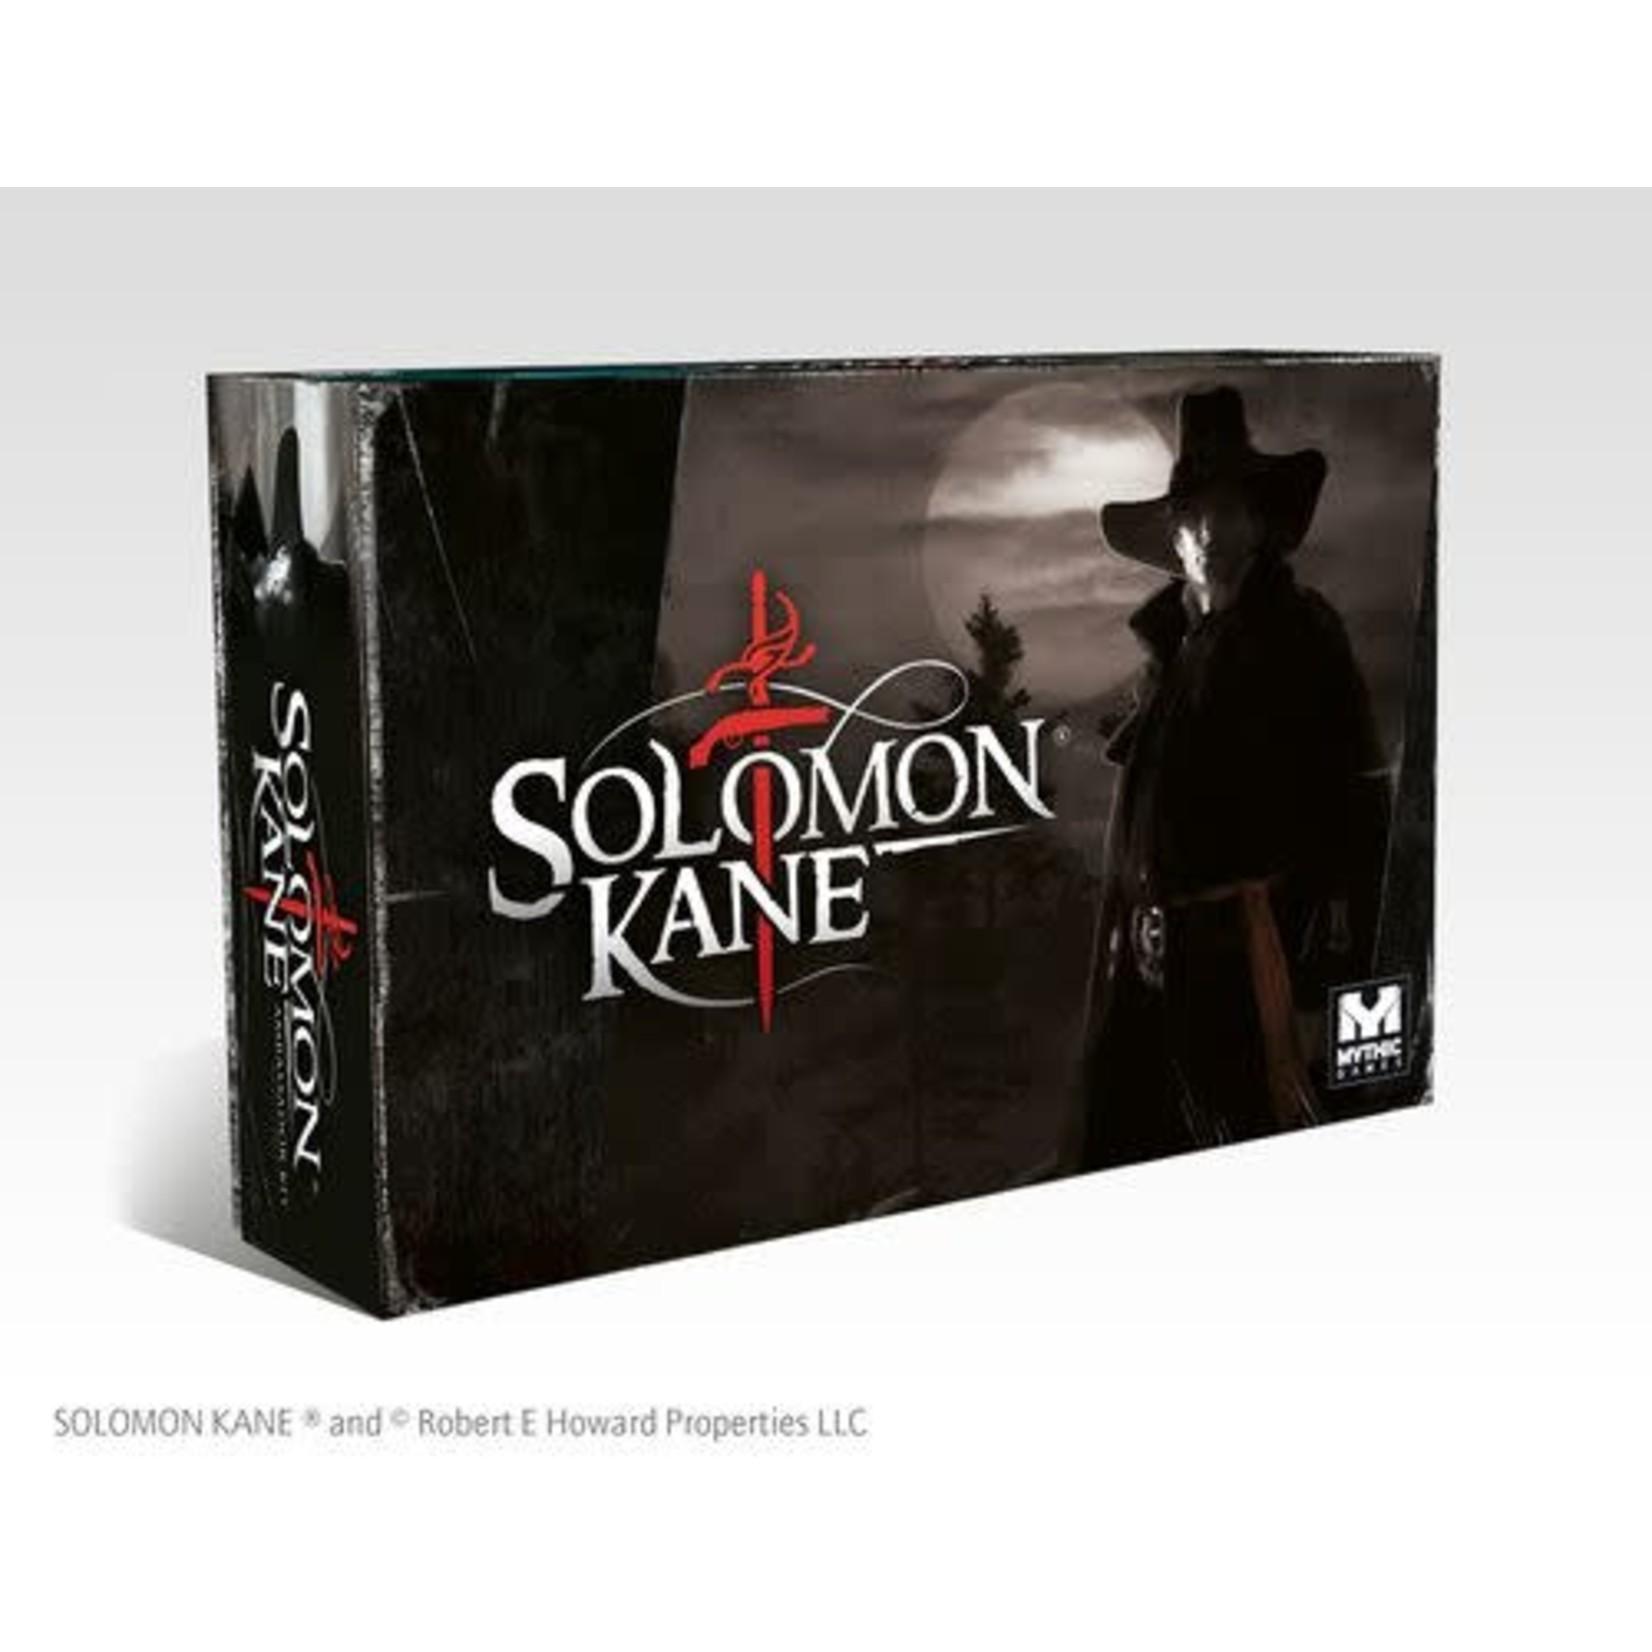 Solomon Kane Core Puritan Kickstarter